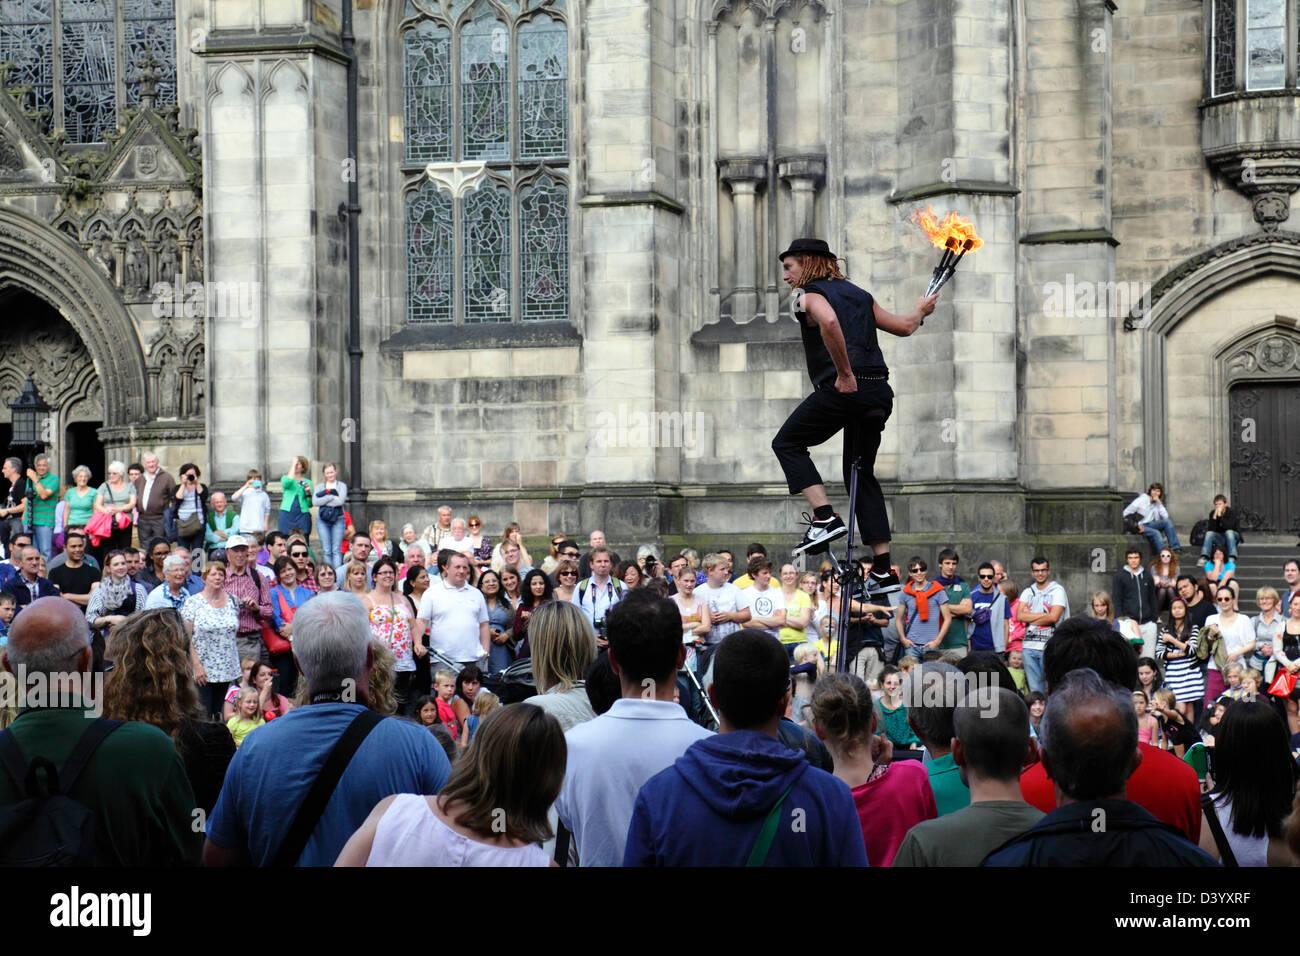 A street performer at the Edinburgh Fringe, Scotland, UK - Stock Image